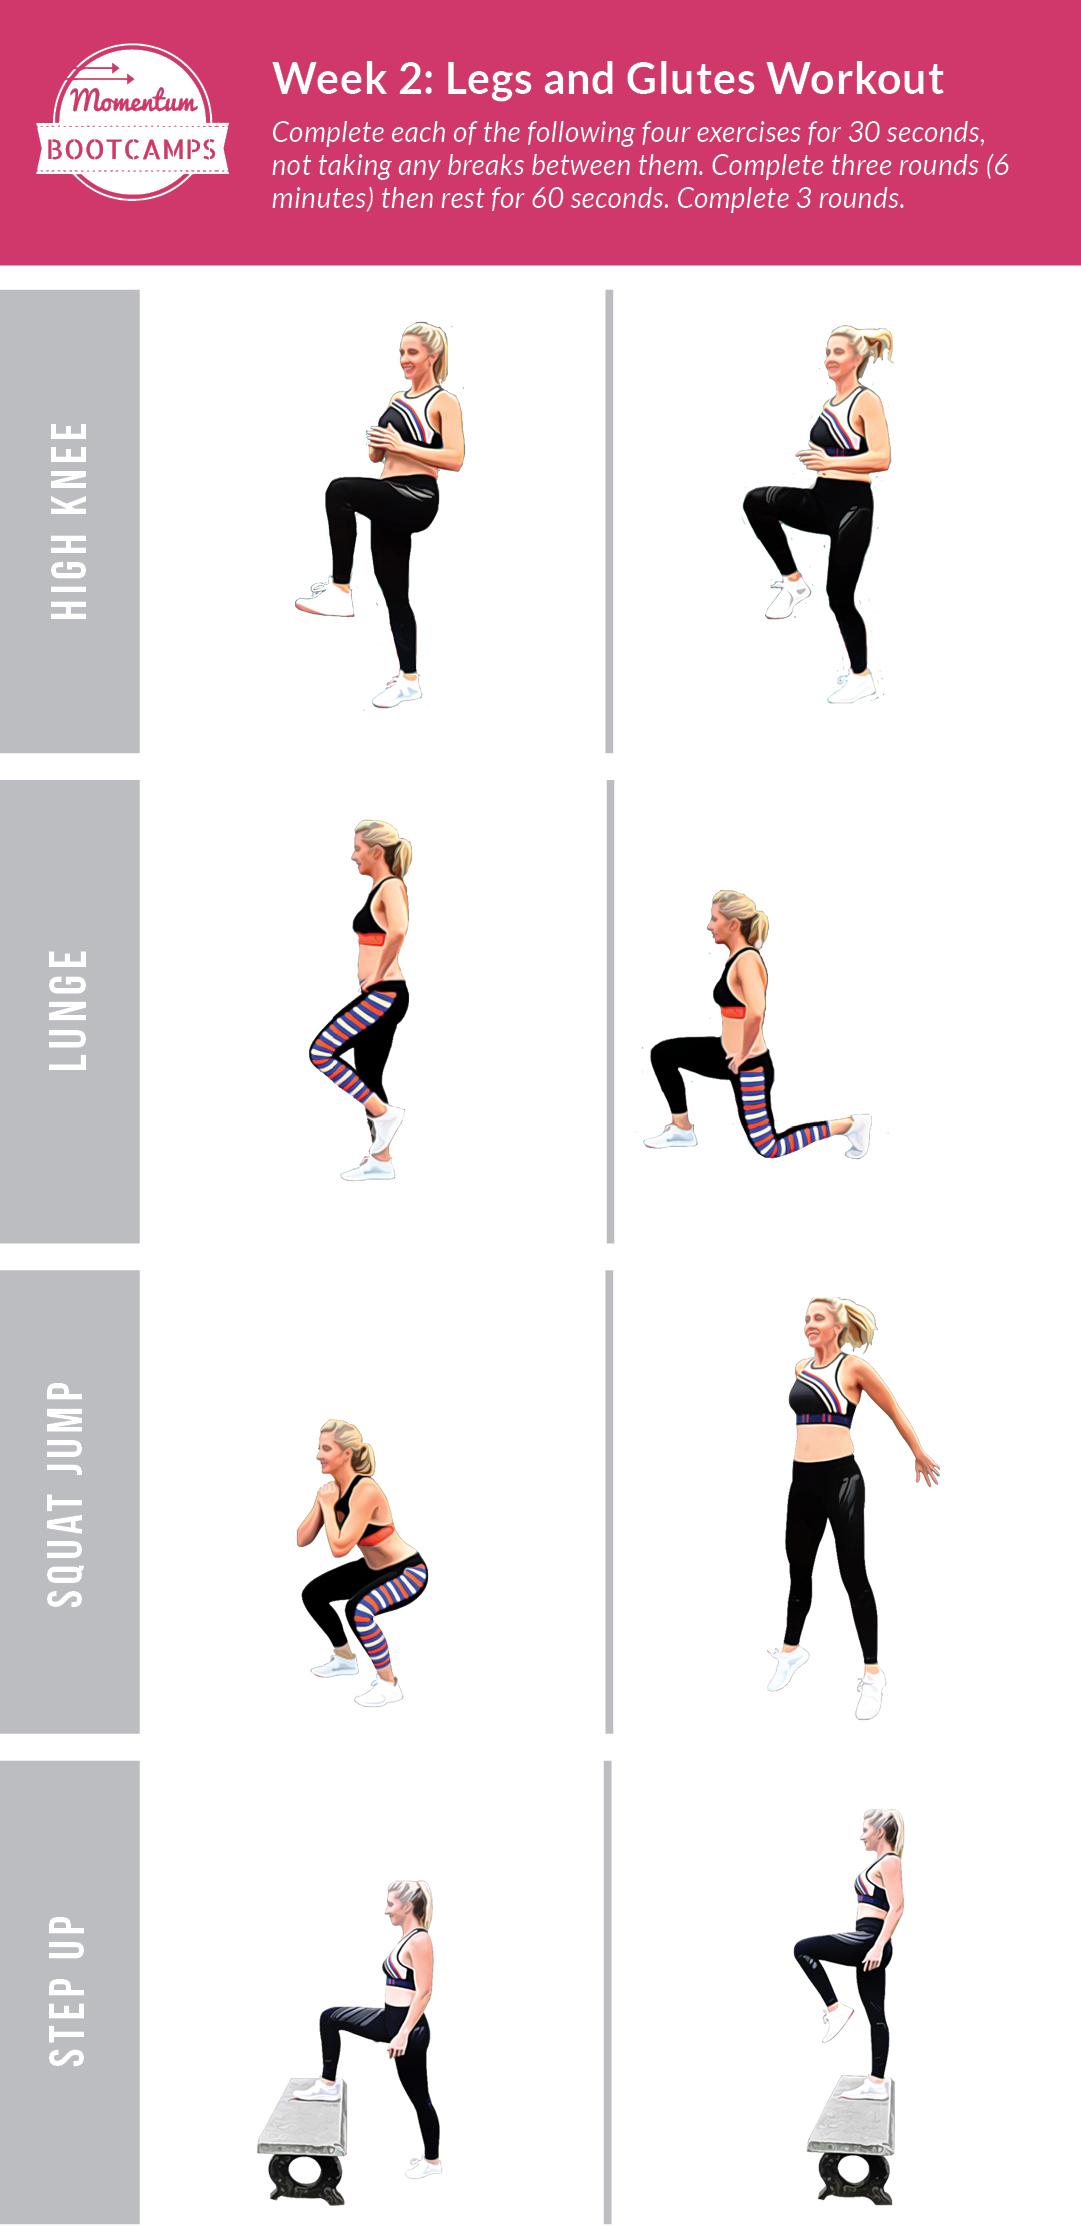 Workout2 (1).jpg